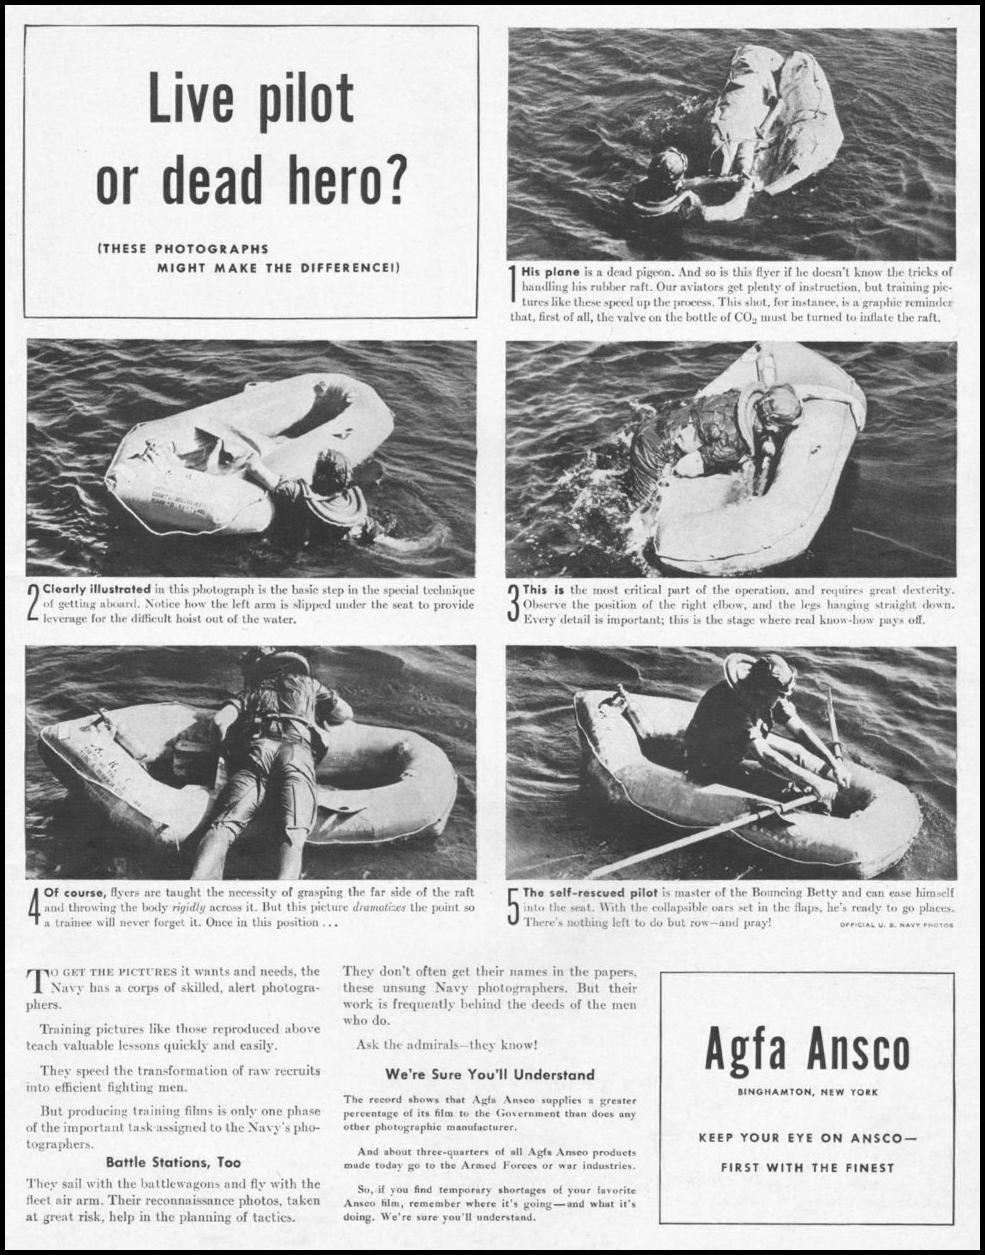 AGFA FILM LIFE 10/25/1943 p. 7